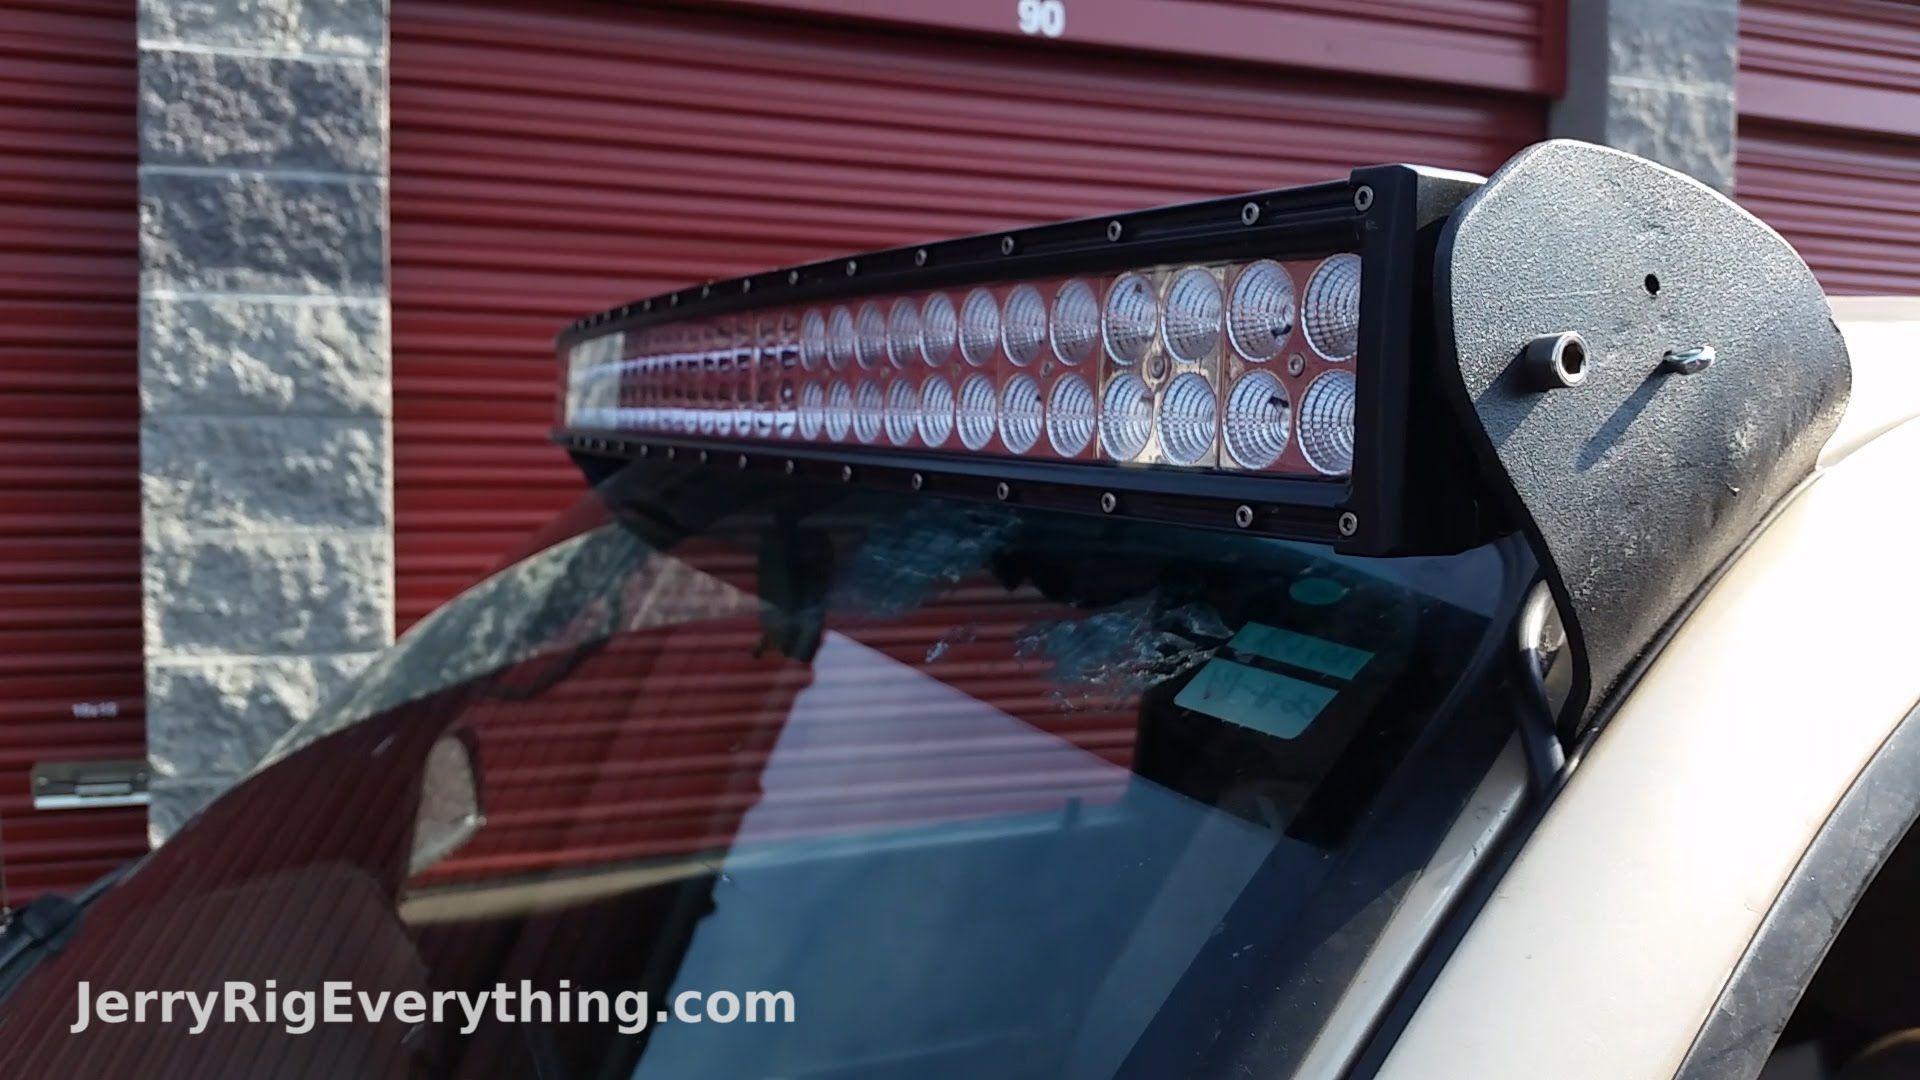 Making Custom Brackets For A 50 Inch Led Light Bar Truck Mount Led Light Bars Led Light Bar Truck Roofing Diy